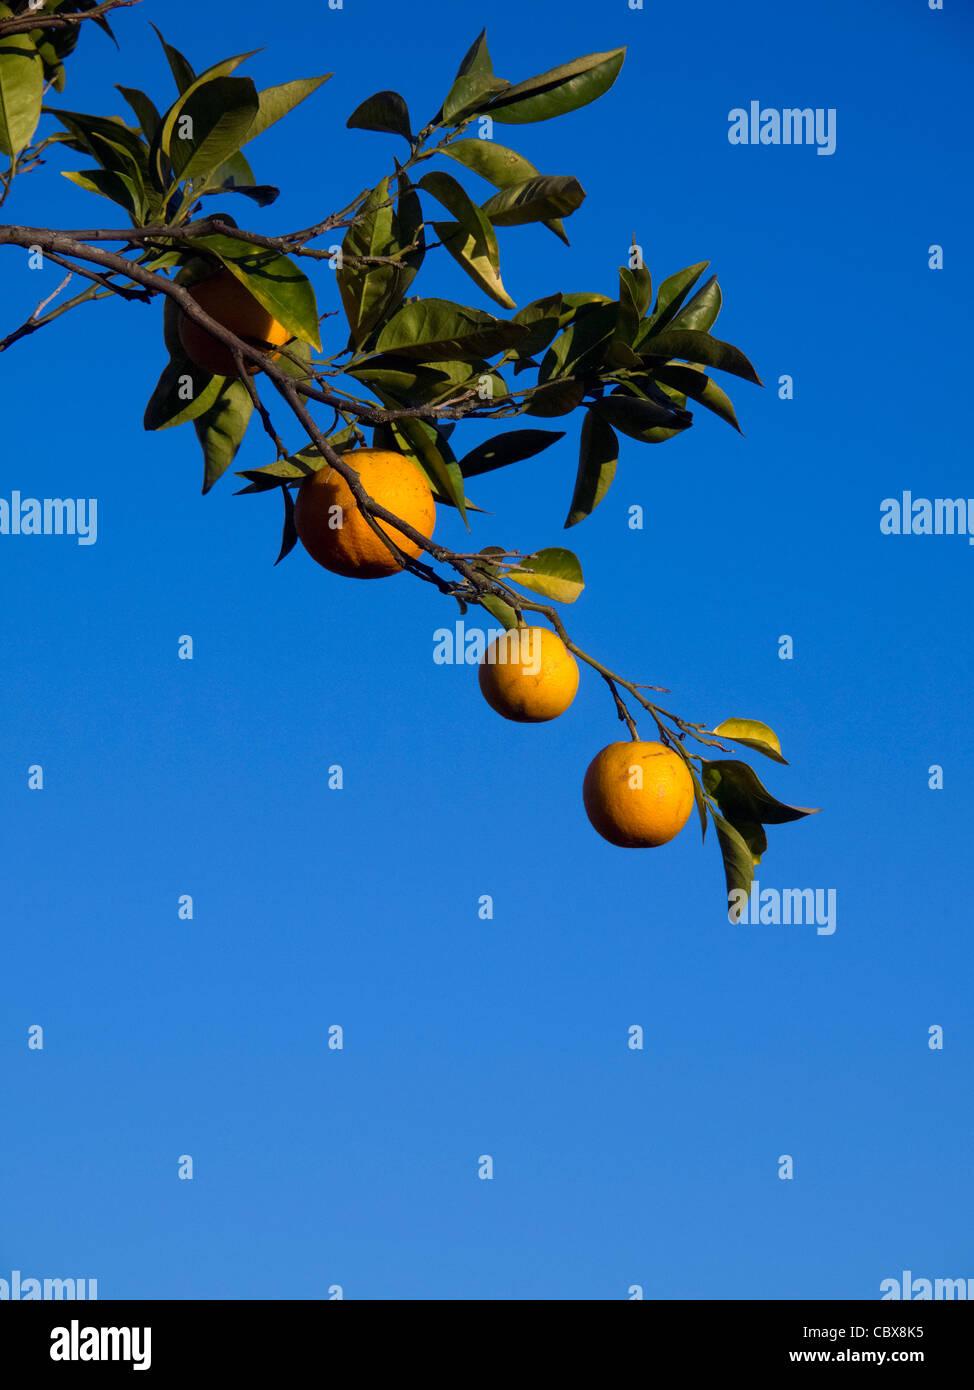 Ripe Oranges In Orange Tree Branch Against A Blue Sky Stock Photo Alamy